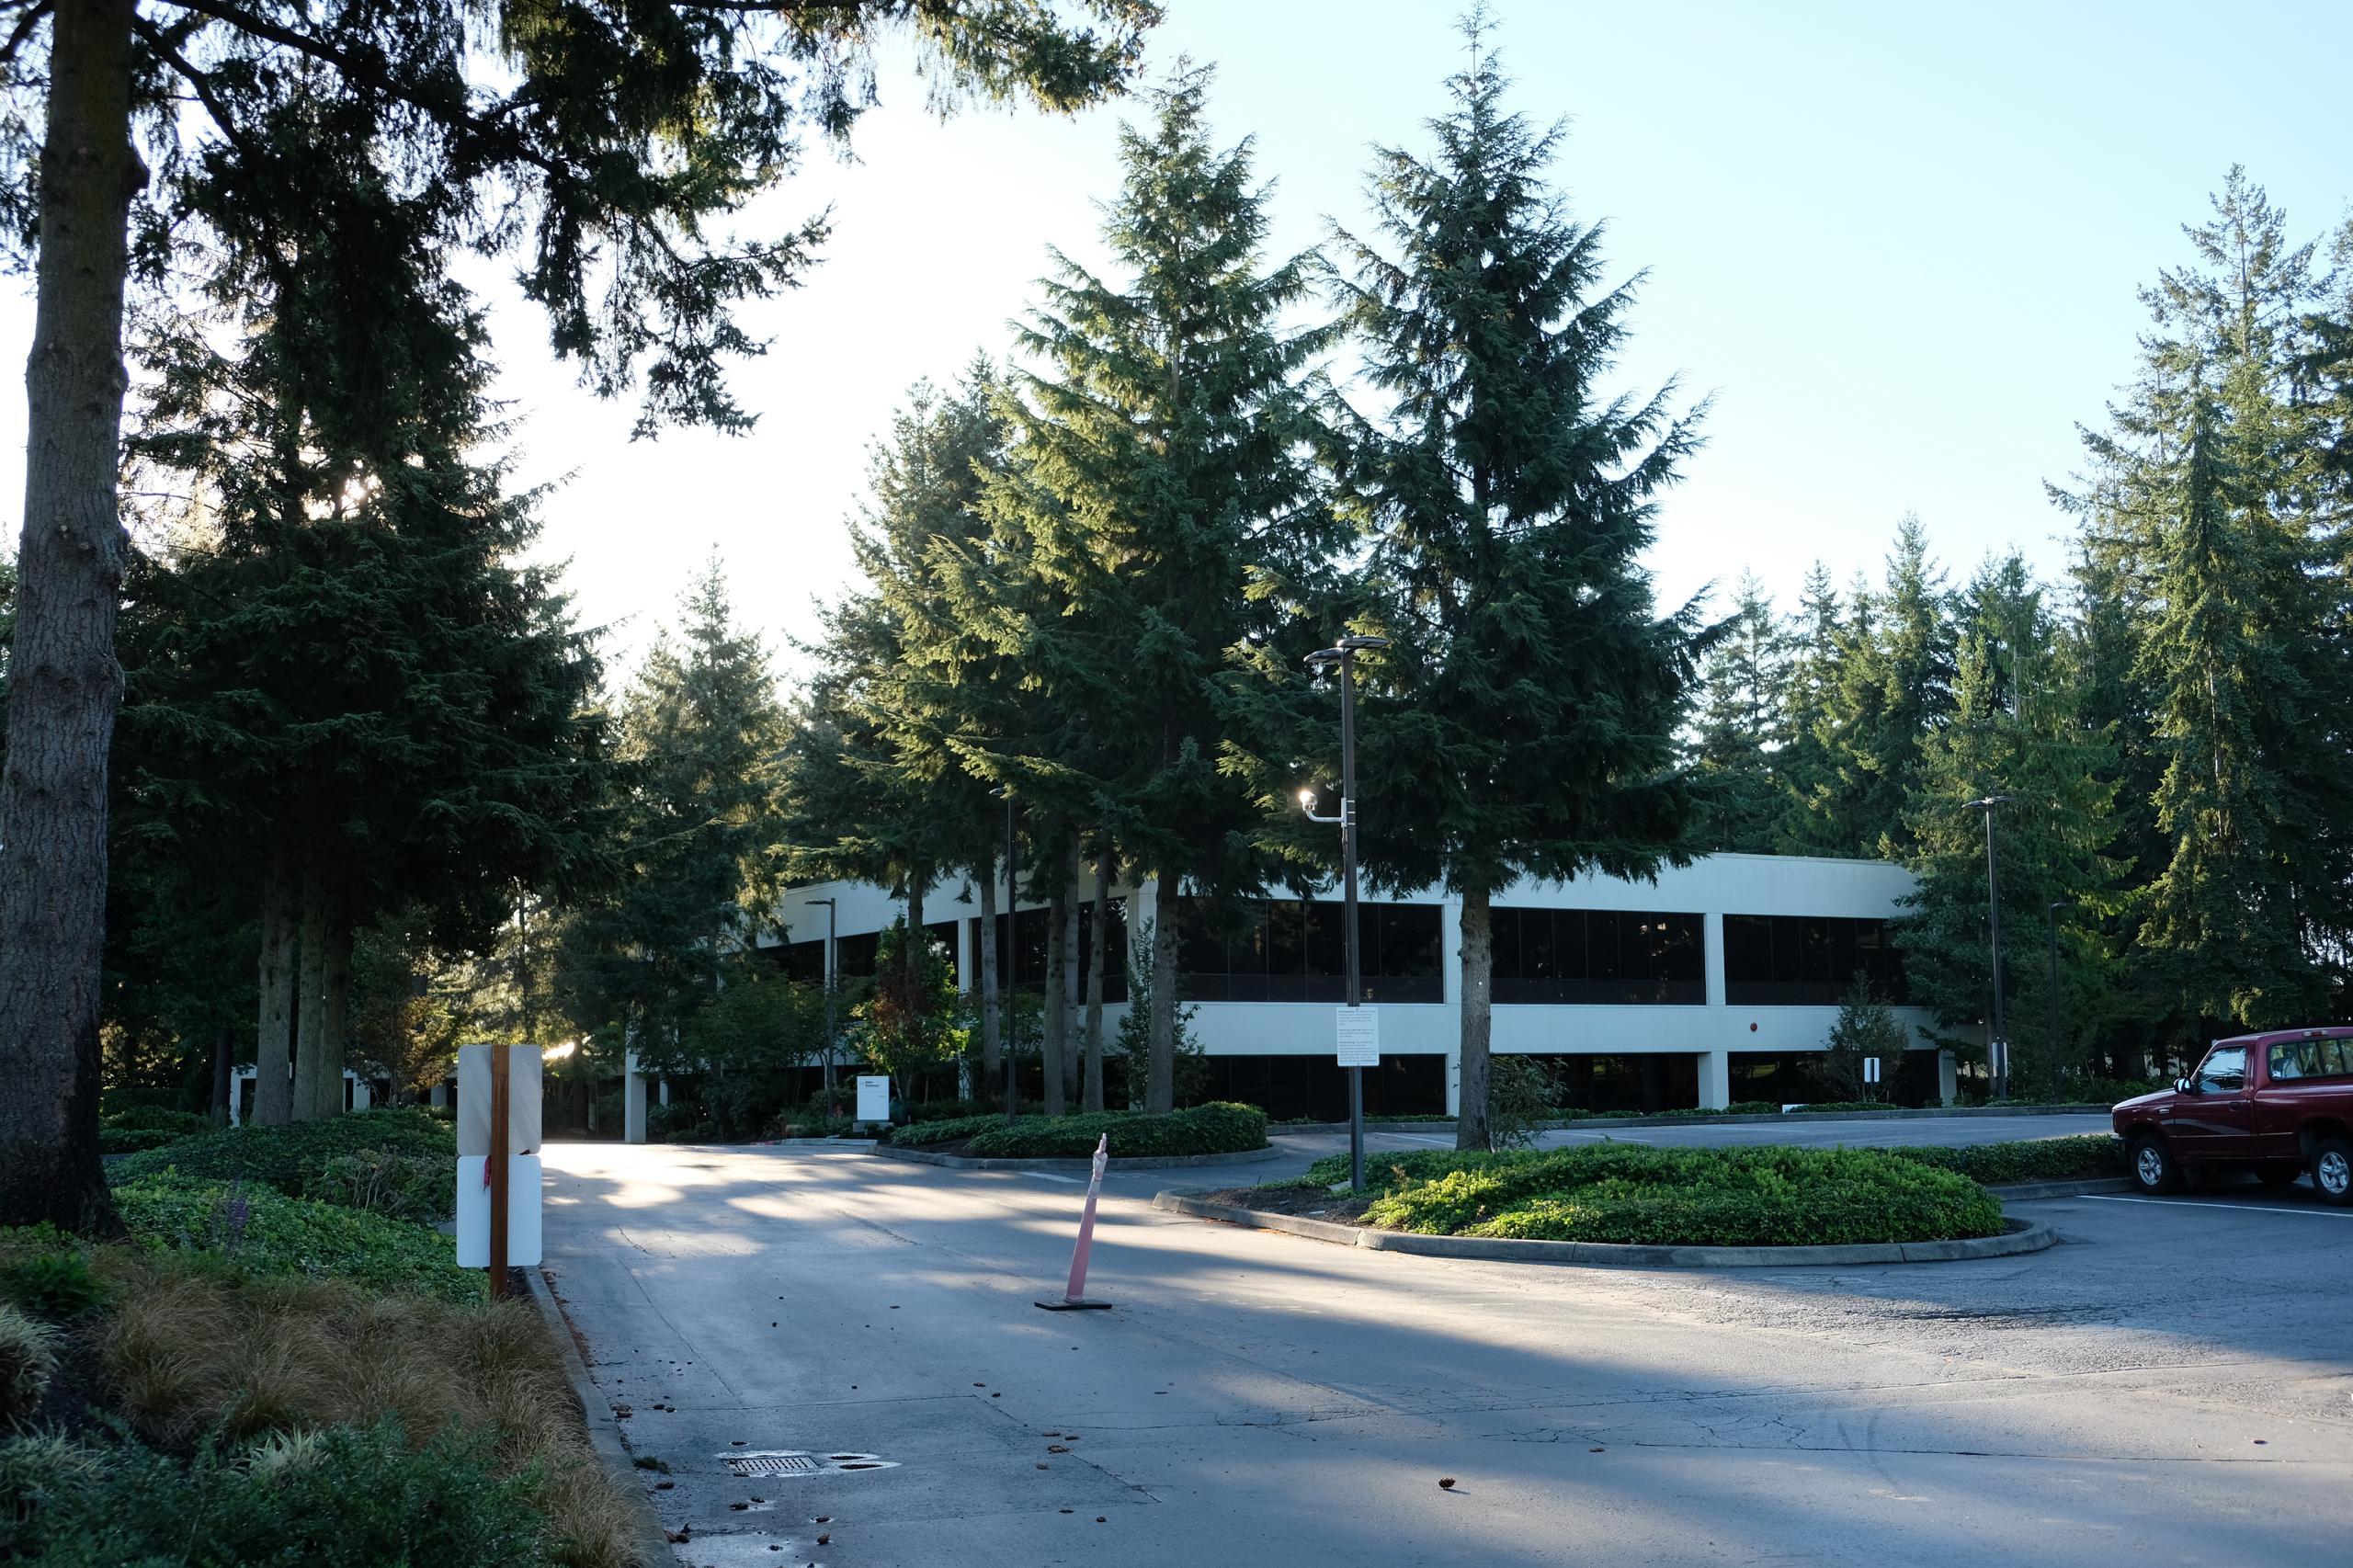 Alaska Airlines' corporate headquarters in Seattle, Washington.